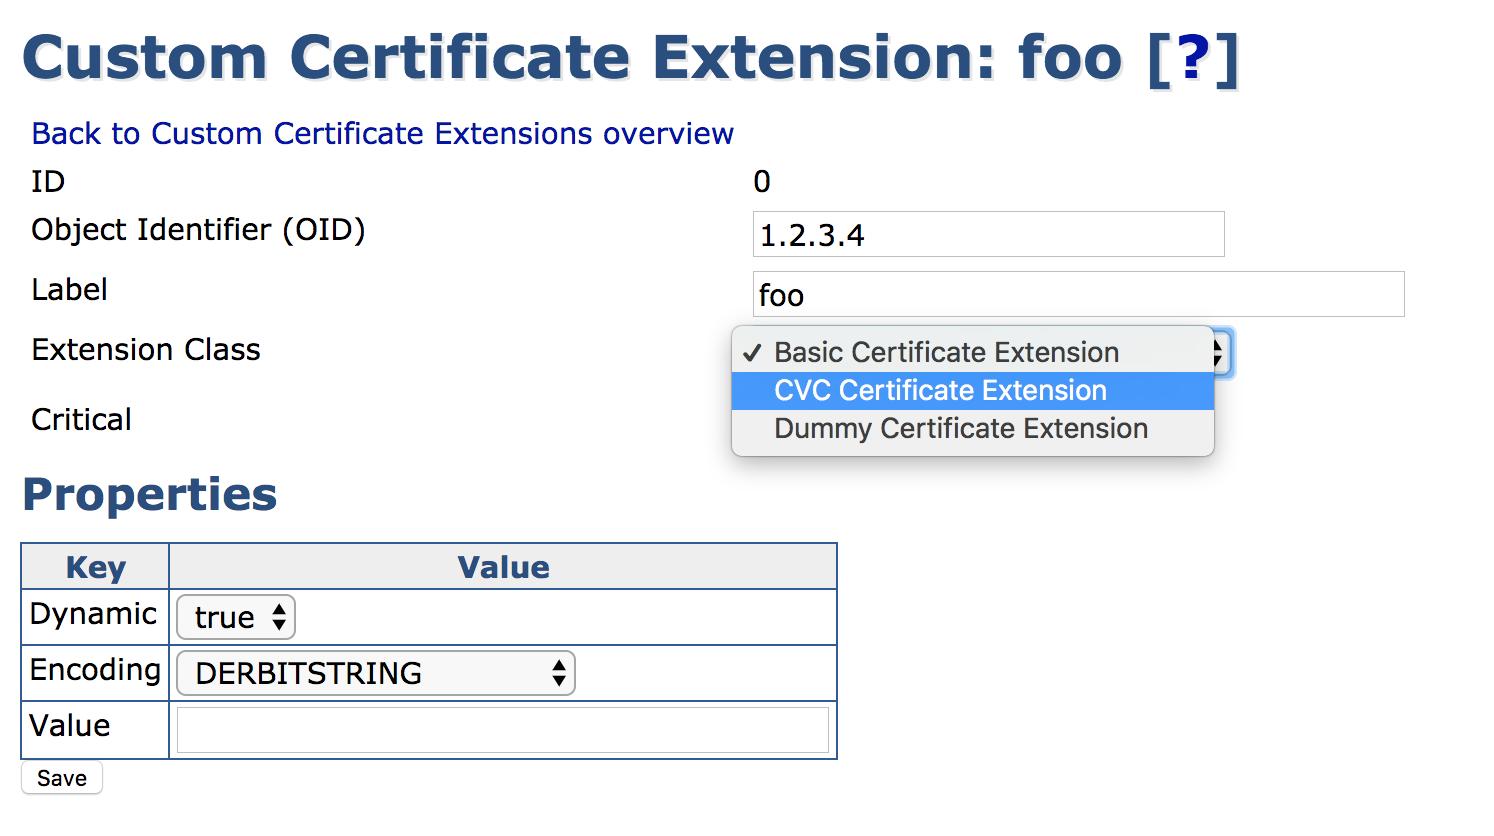 Ejbca Open Source Enterprise Pki Ejbca 6101 Performance And